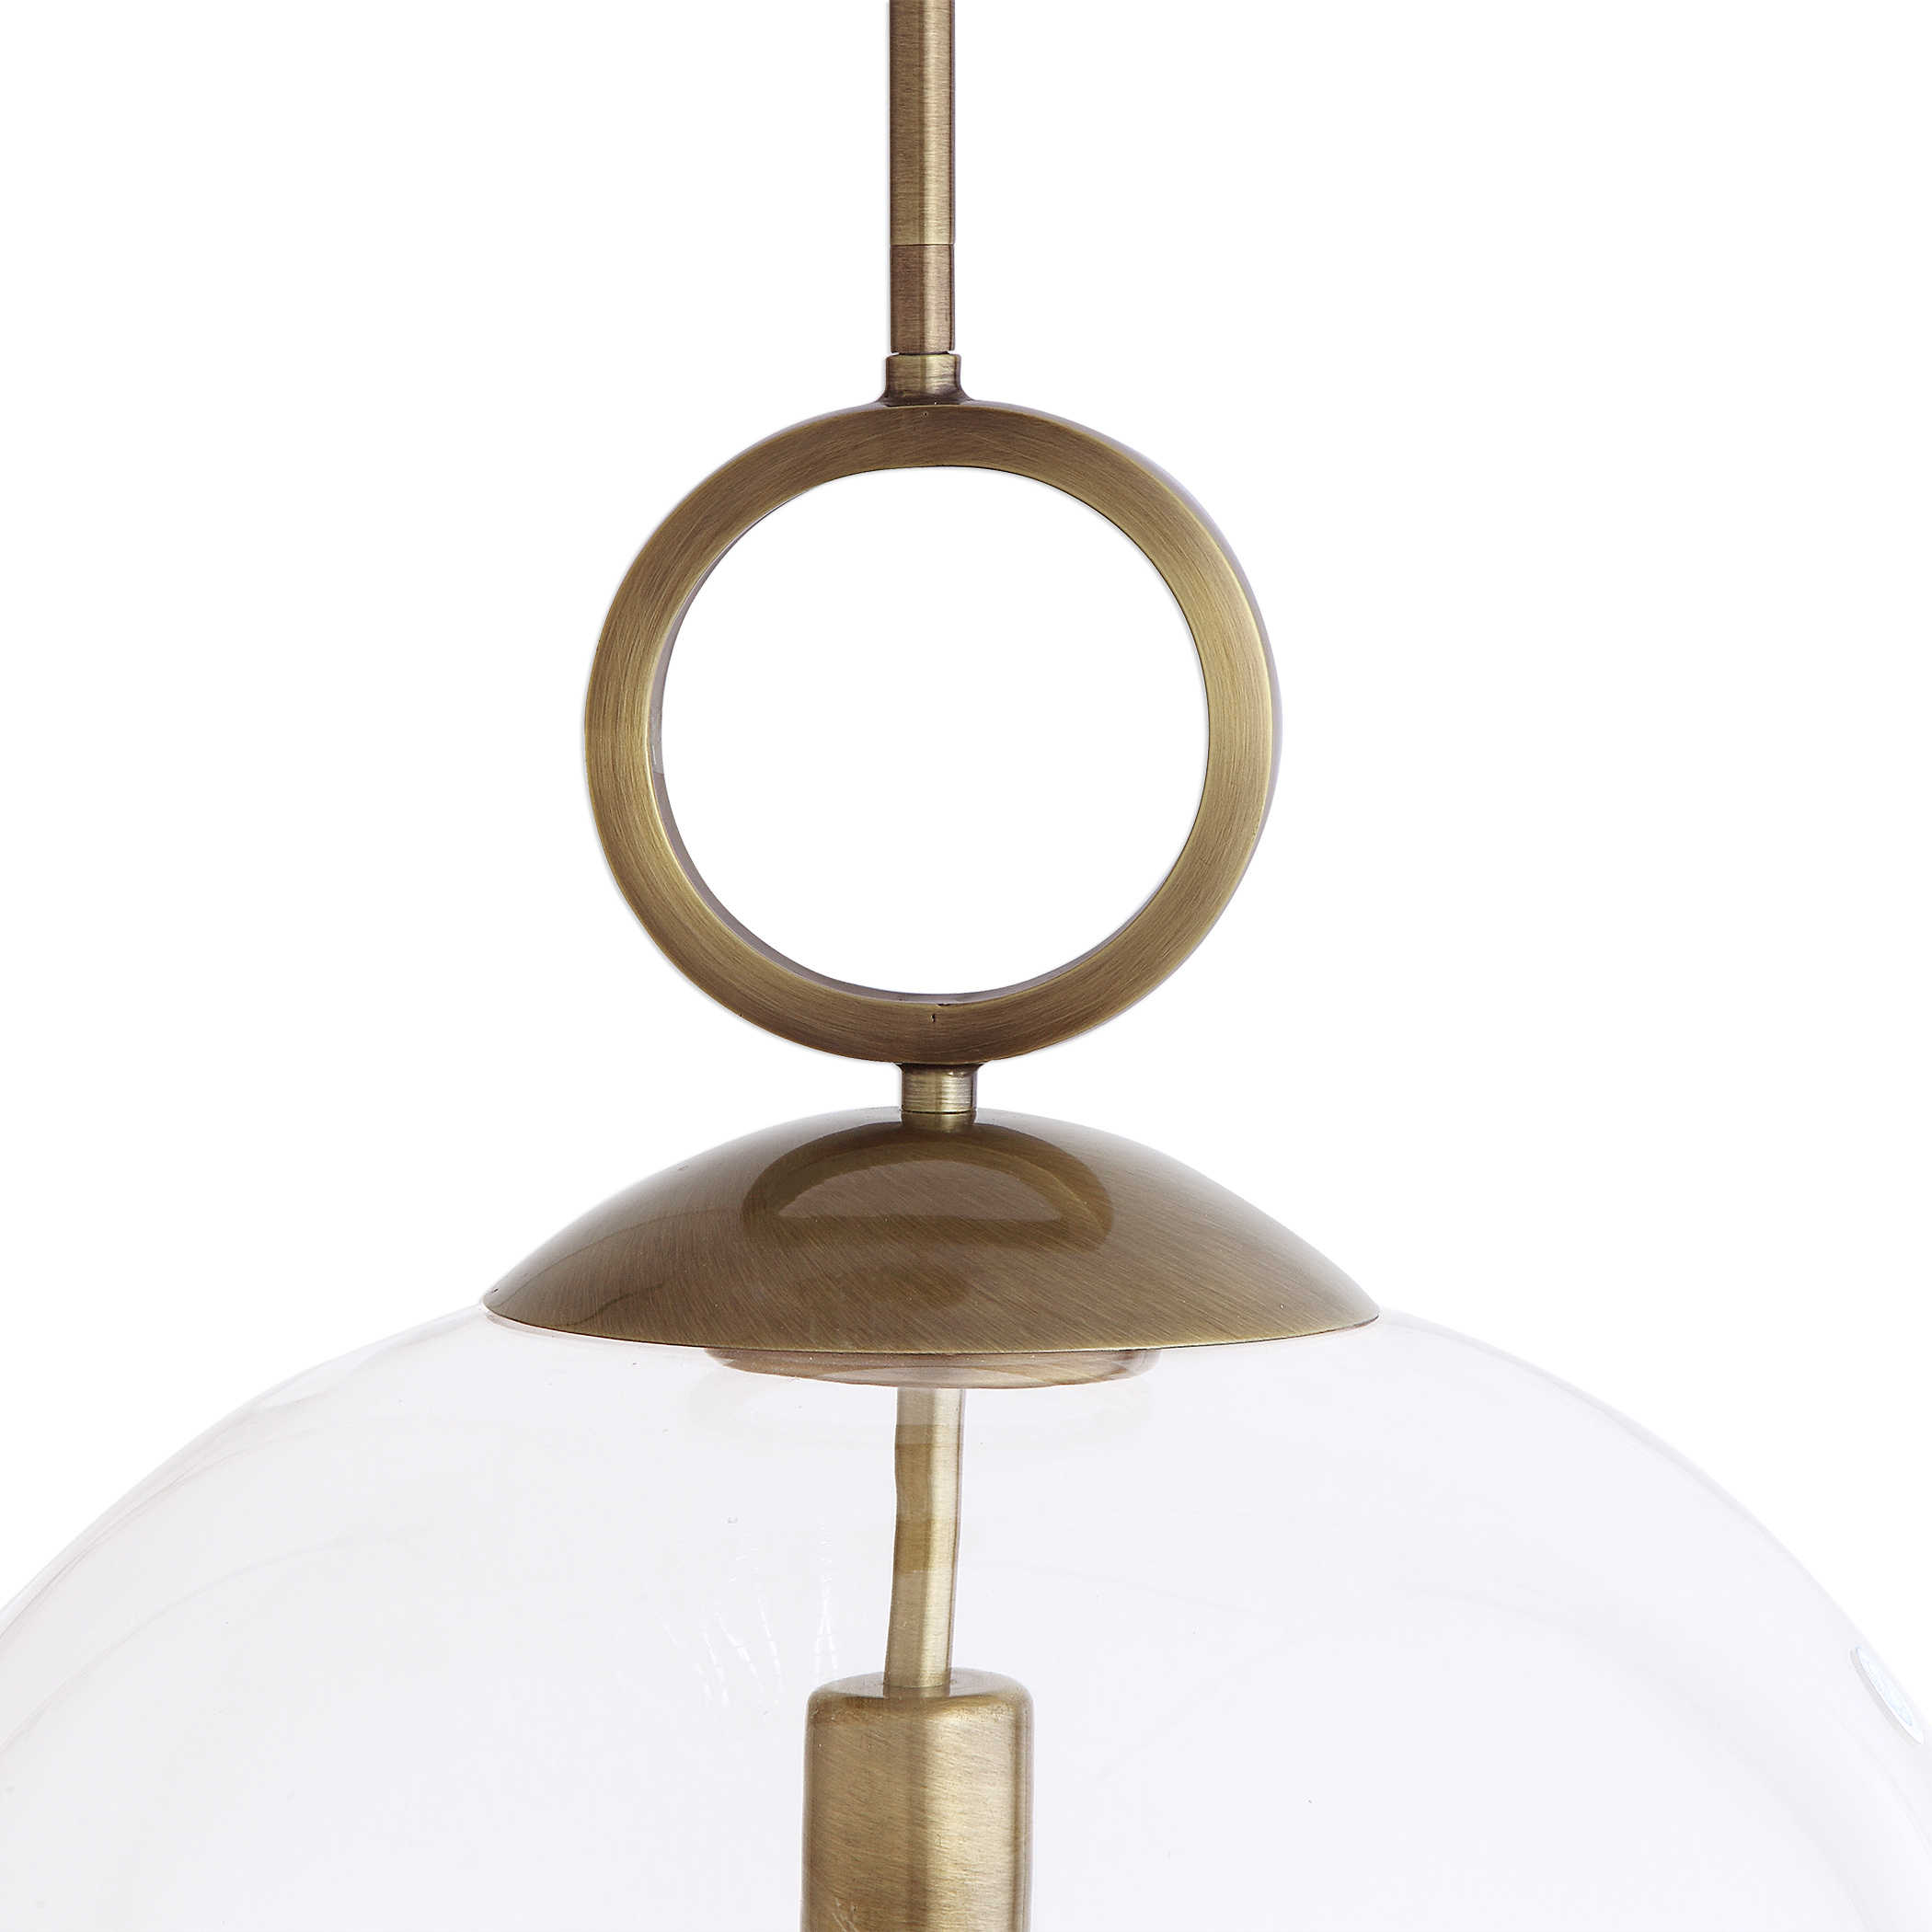 Uttermost Calix Large Blown Glass 1 Light Pendant